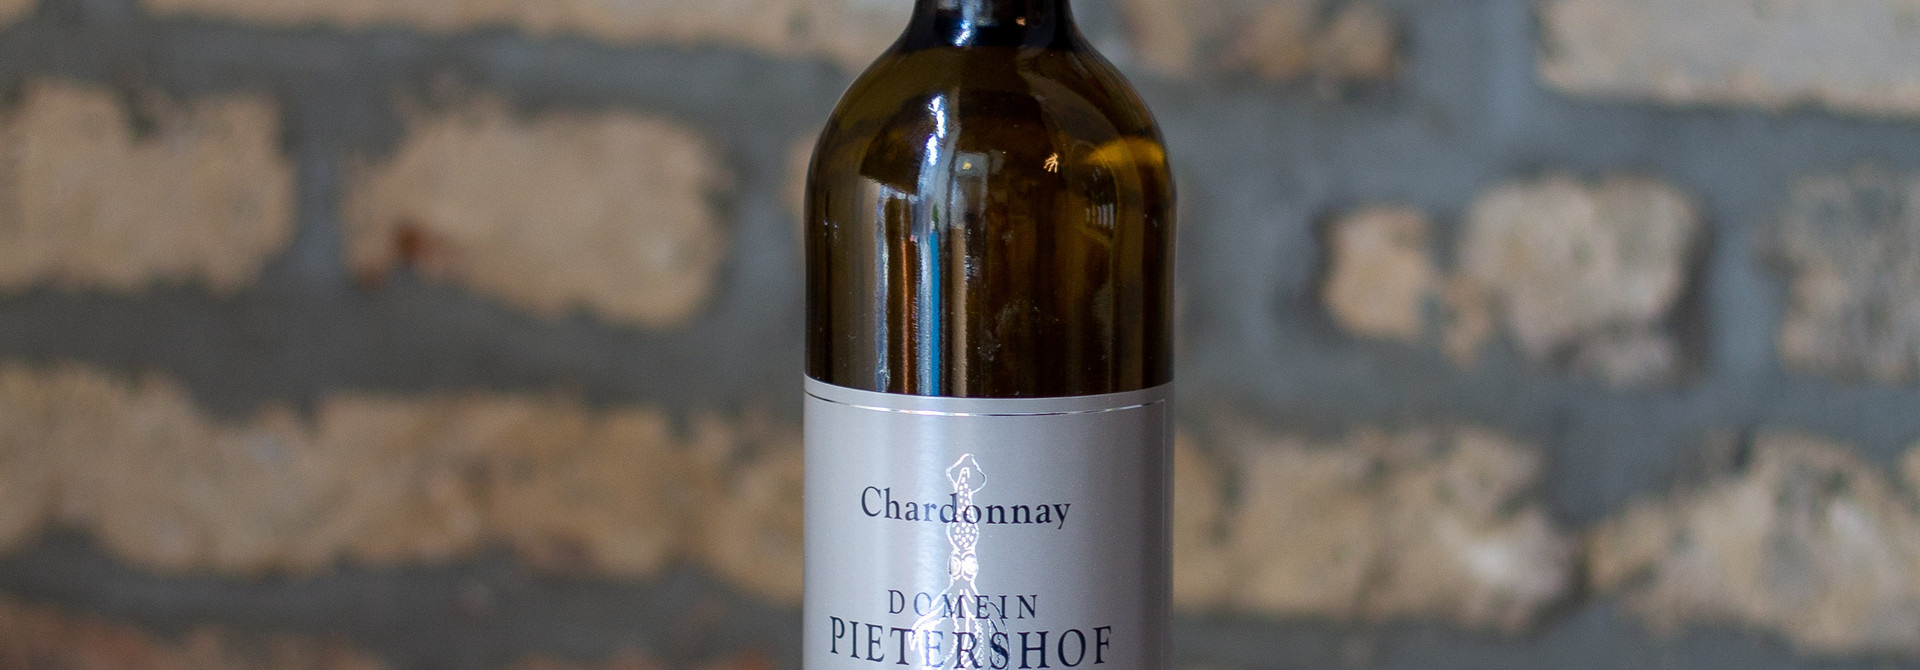 Pietershof Chardonnay 2017